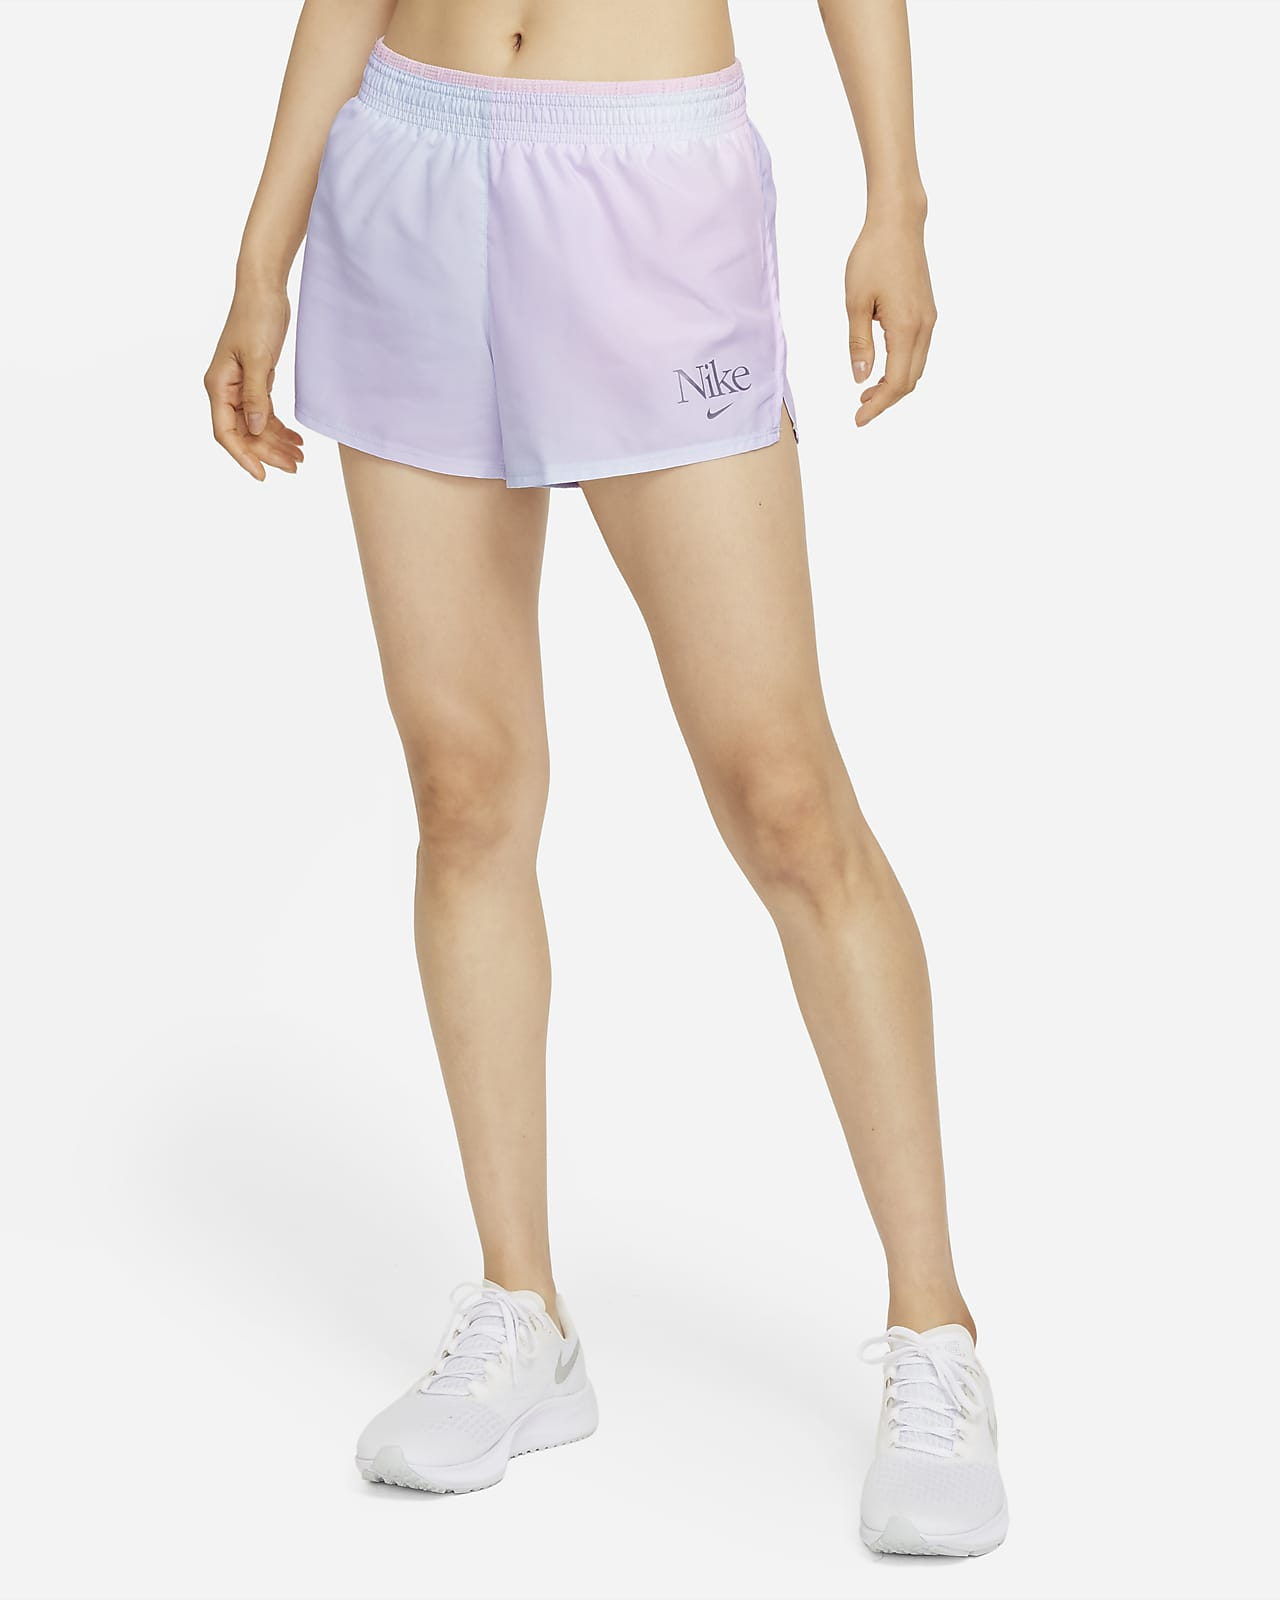 Nike Dri-FIT Femme 10K 女款跑步短褲